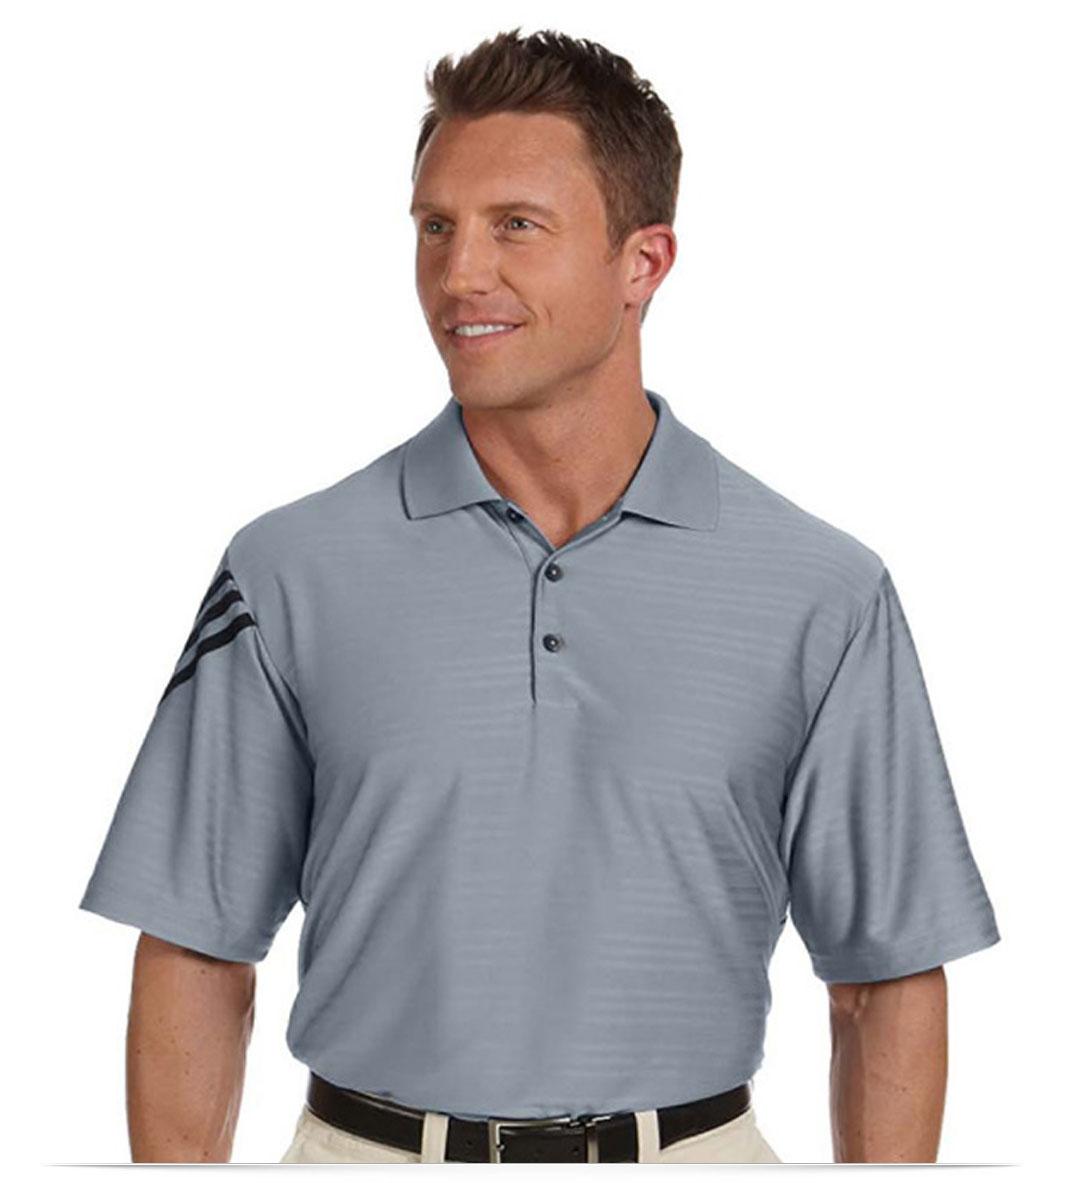 Customize Adidas Mesh Polo Shirt